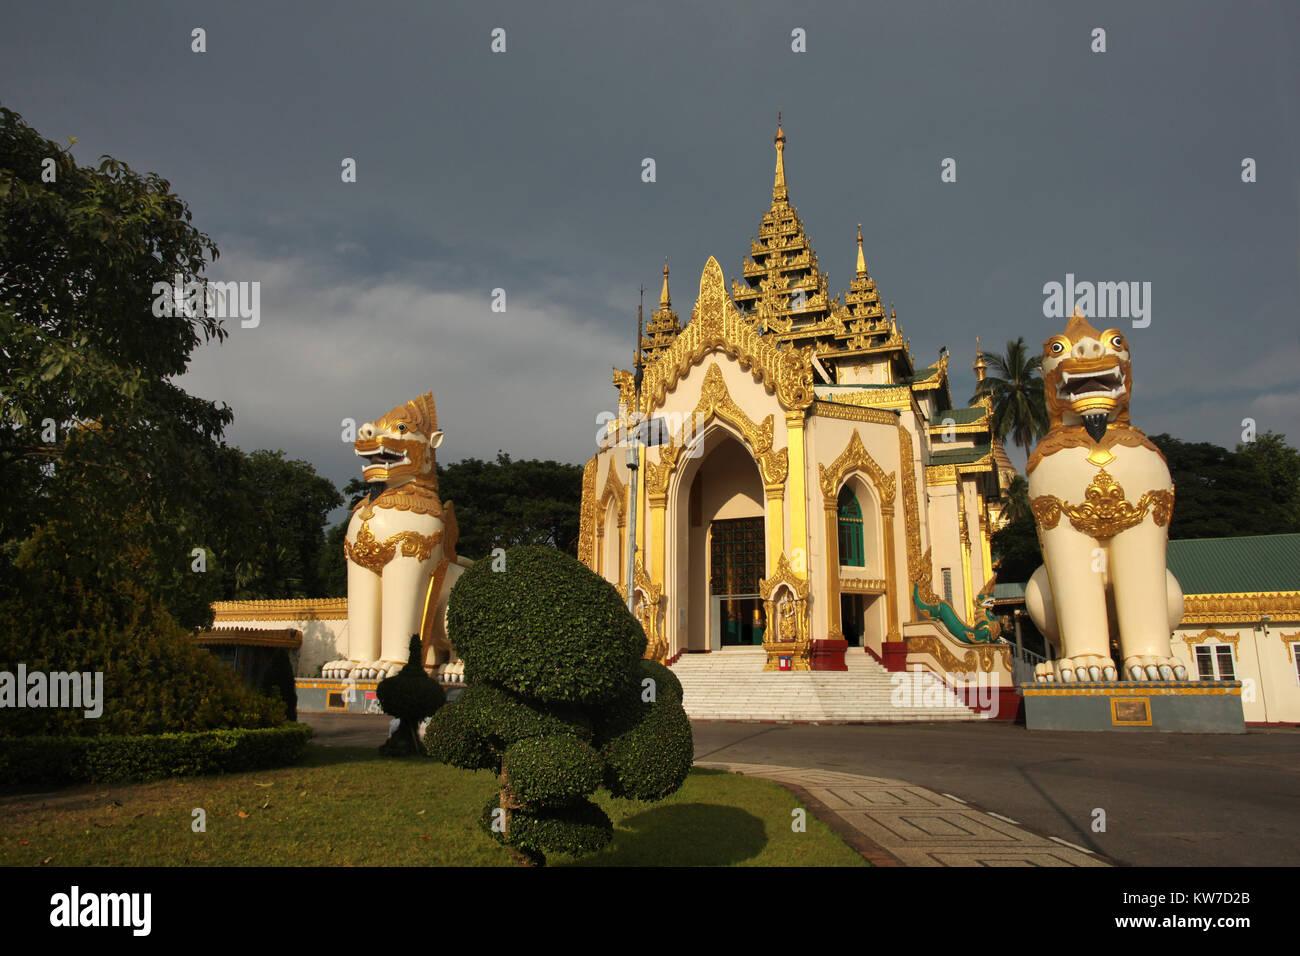 The entrance to the golden buddhist pagoda or stupa of Shwedagon Pagoda,Yangon, Myanmar. Stock Photo